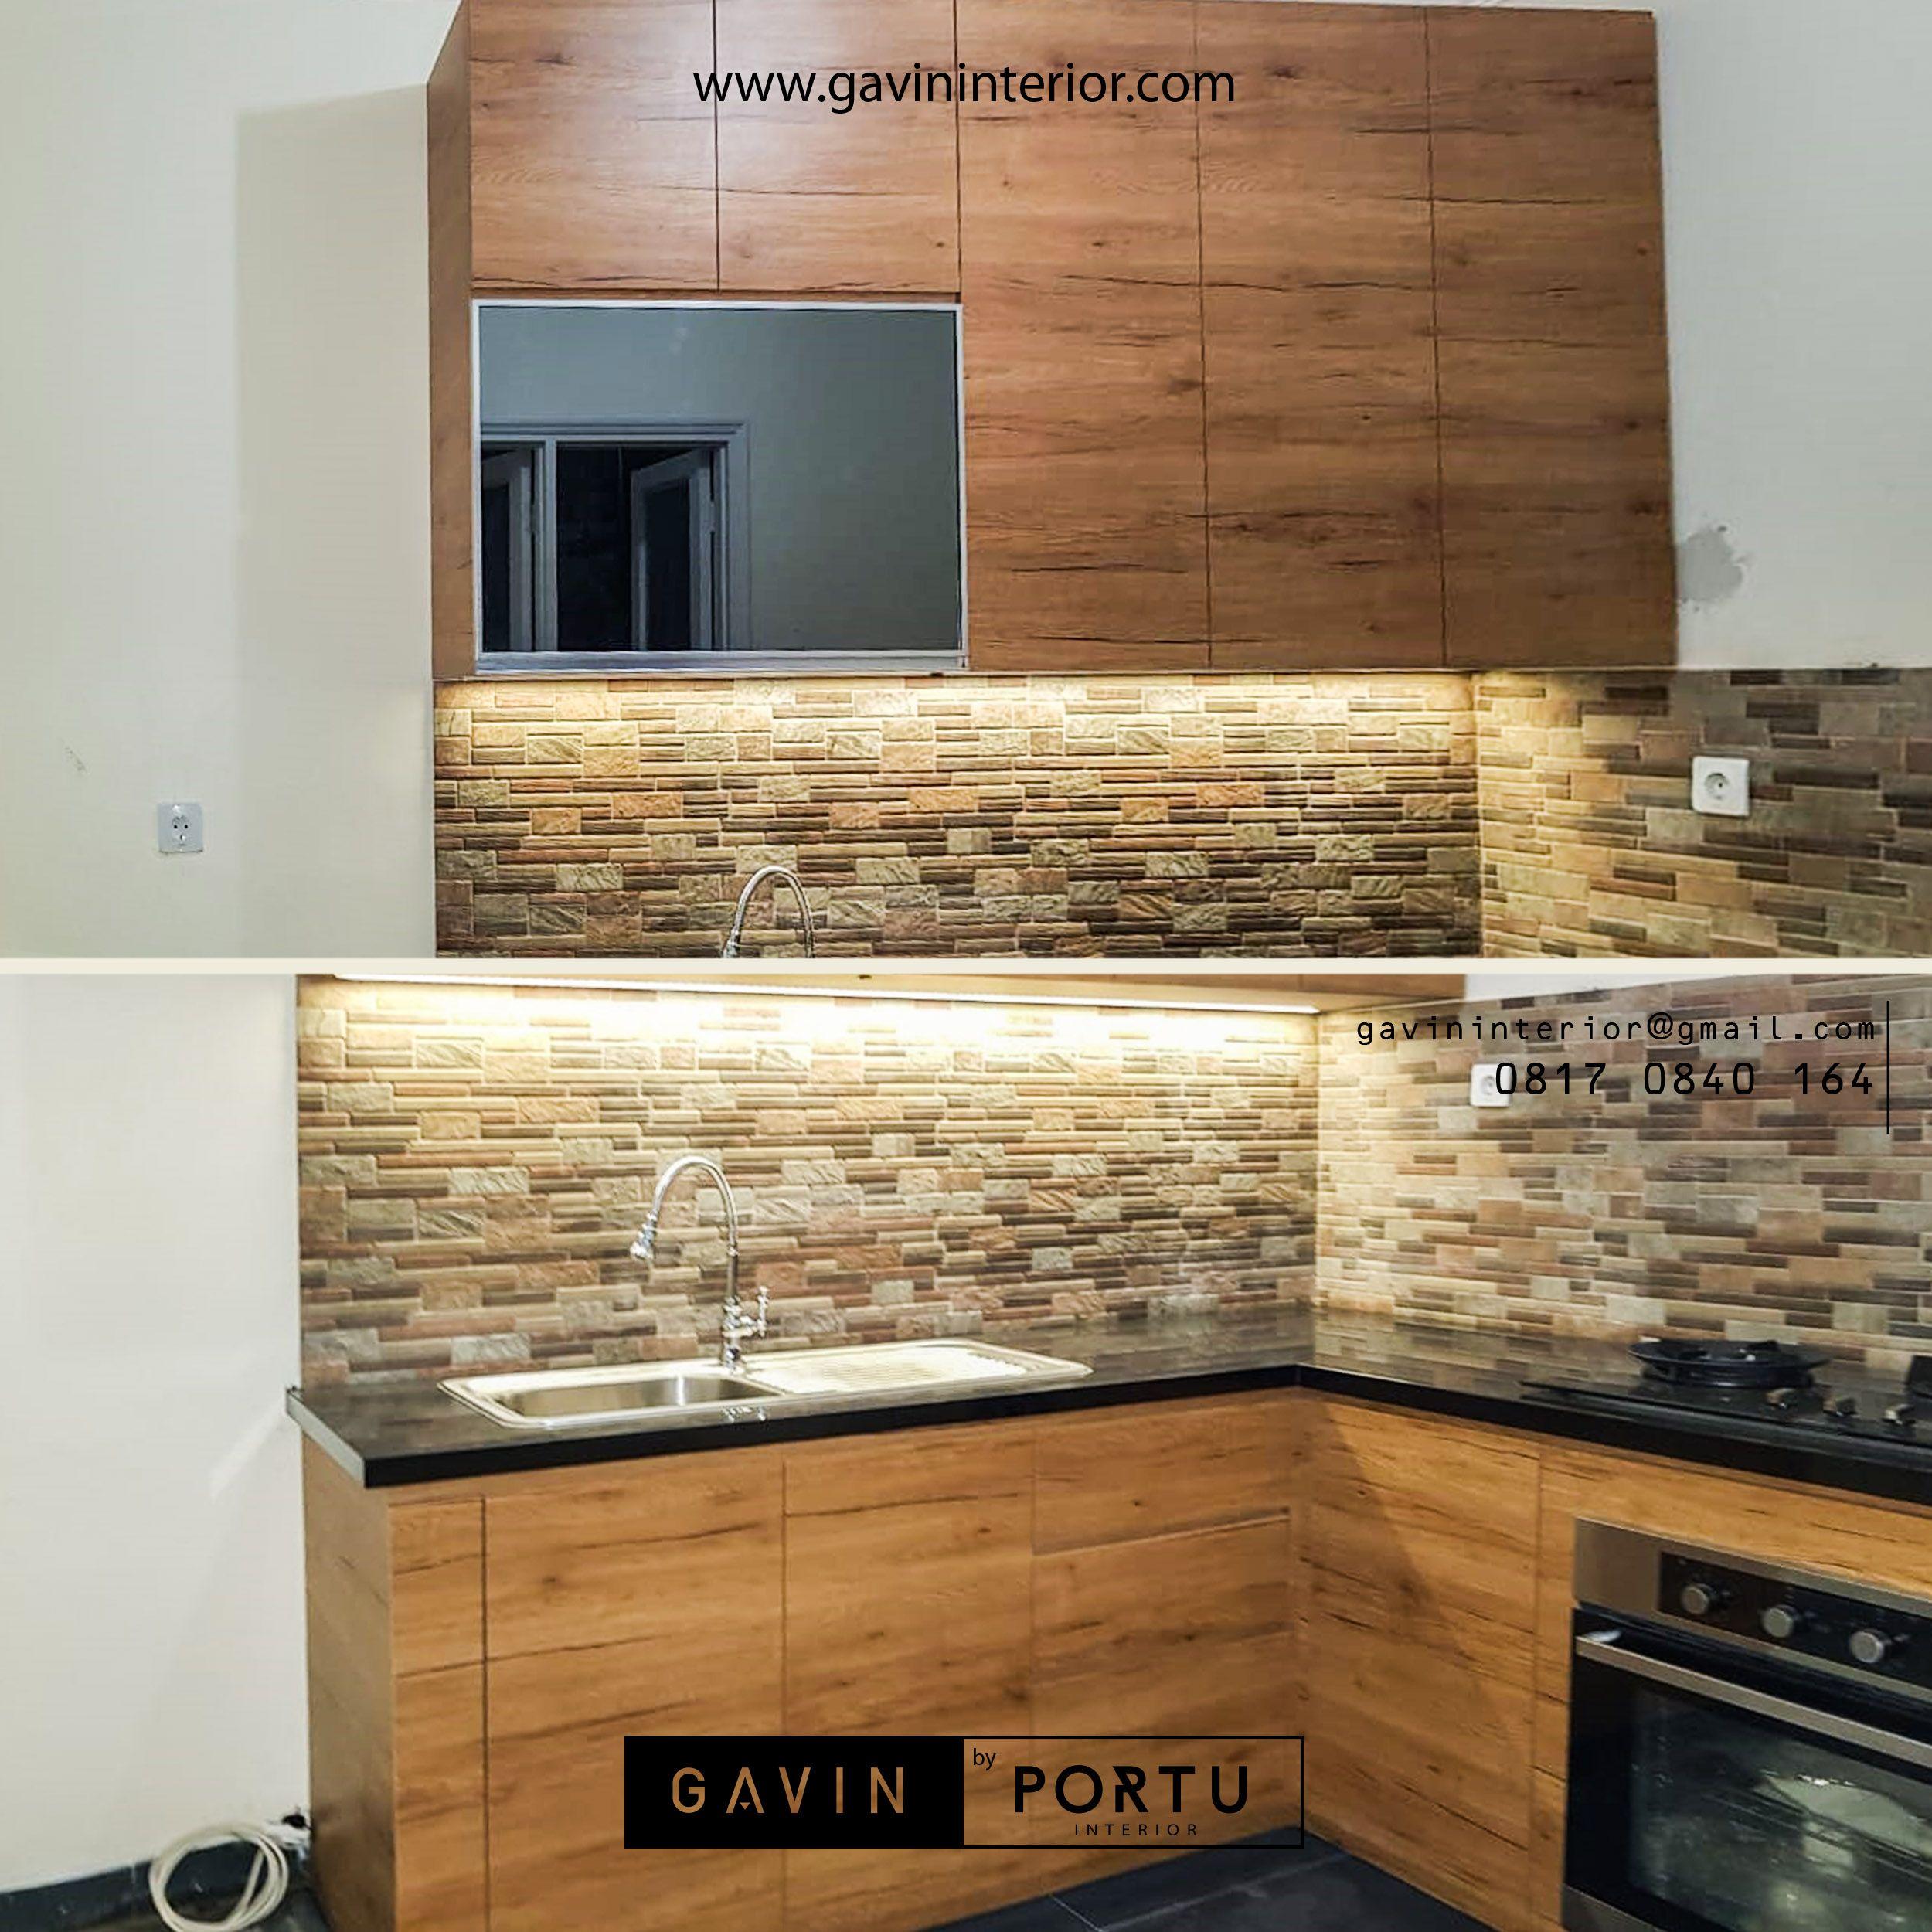 Cara Untuk Menyiasatinya Adalah Menggunakan Kitchen Set Minimalis Dengan Model Kabinet Dapur Bukaan Ke Atas Untuk Anda Yang Mempuny Minimalis Furniture Modern